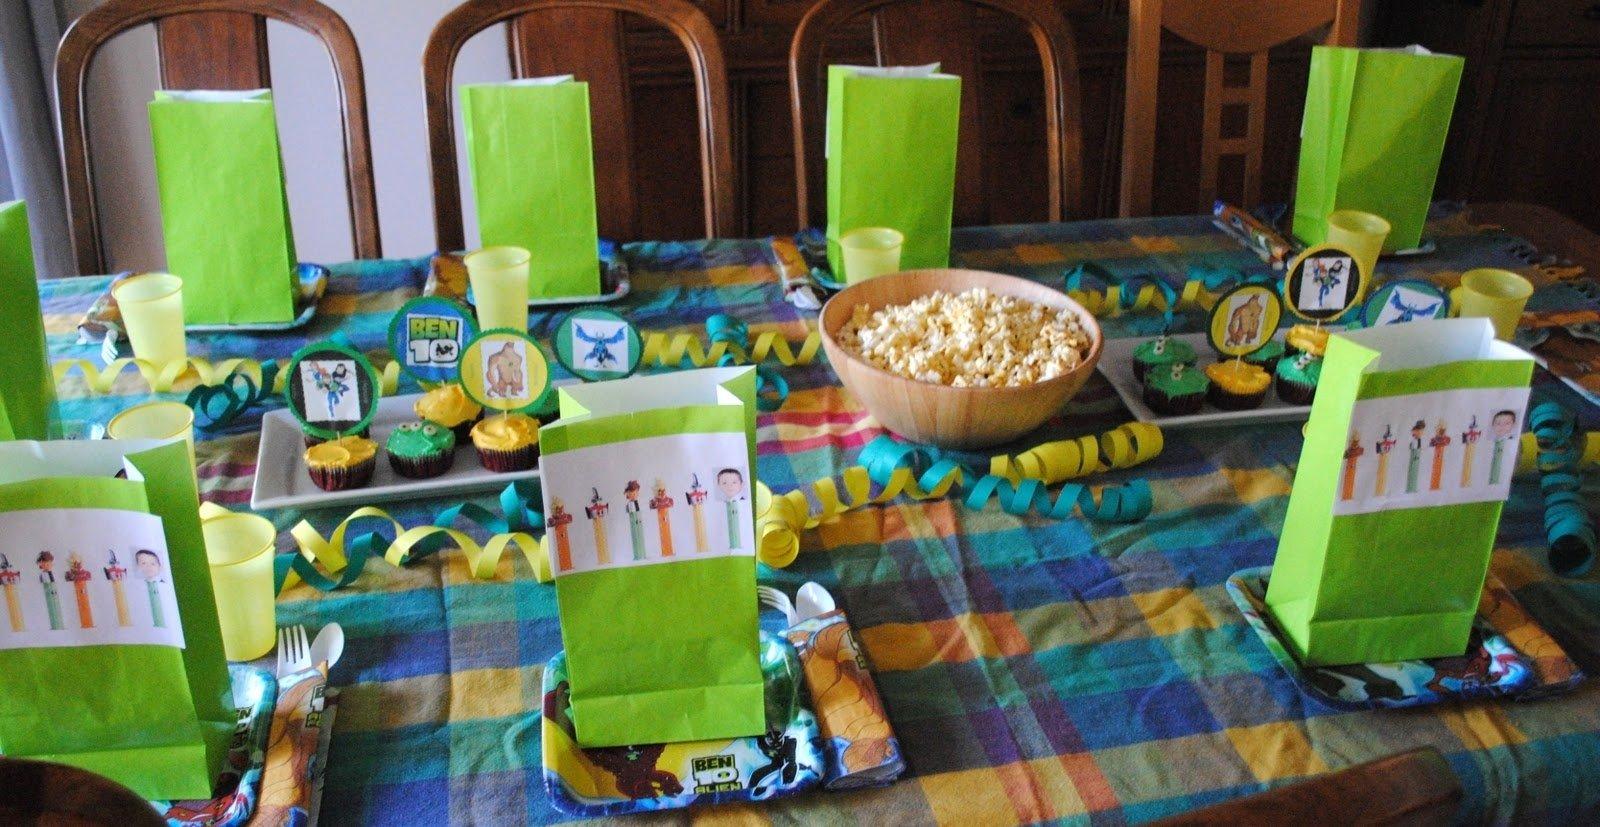 10 Attractive Boys 10Th Birthday Party Ideas a ben 10 birthday party beatnik kids 1 2021